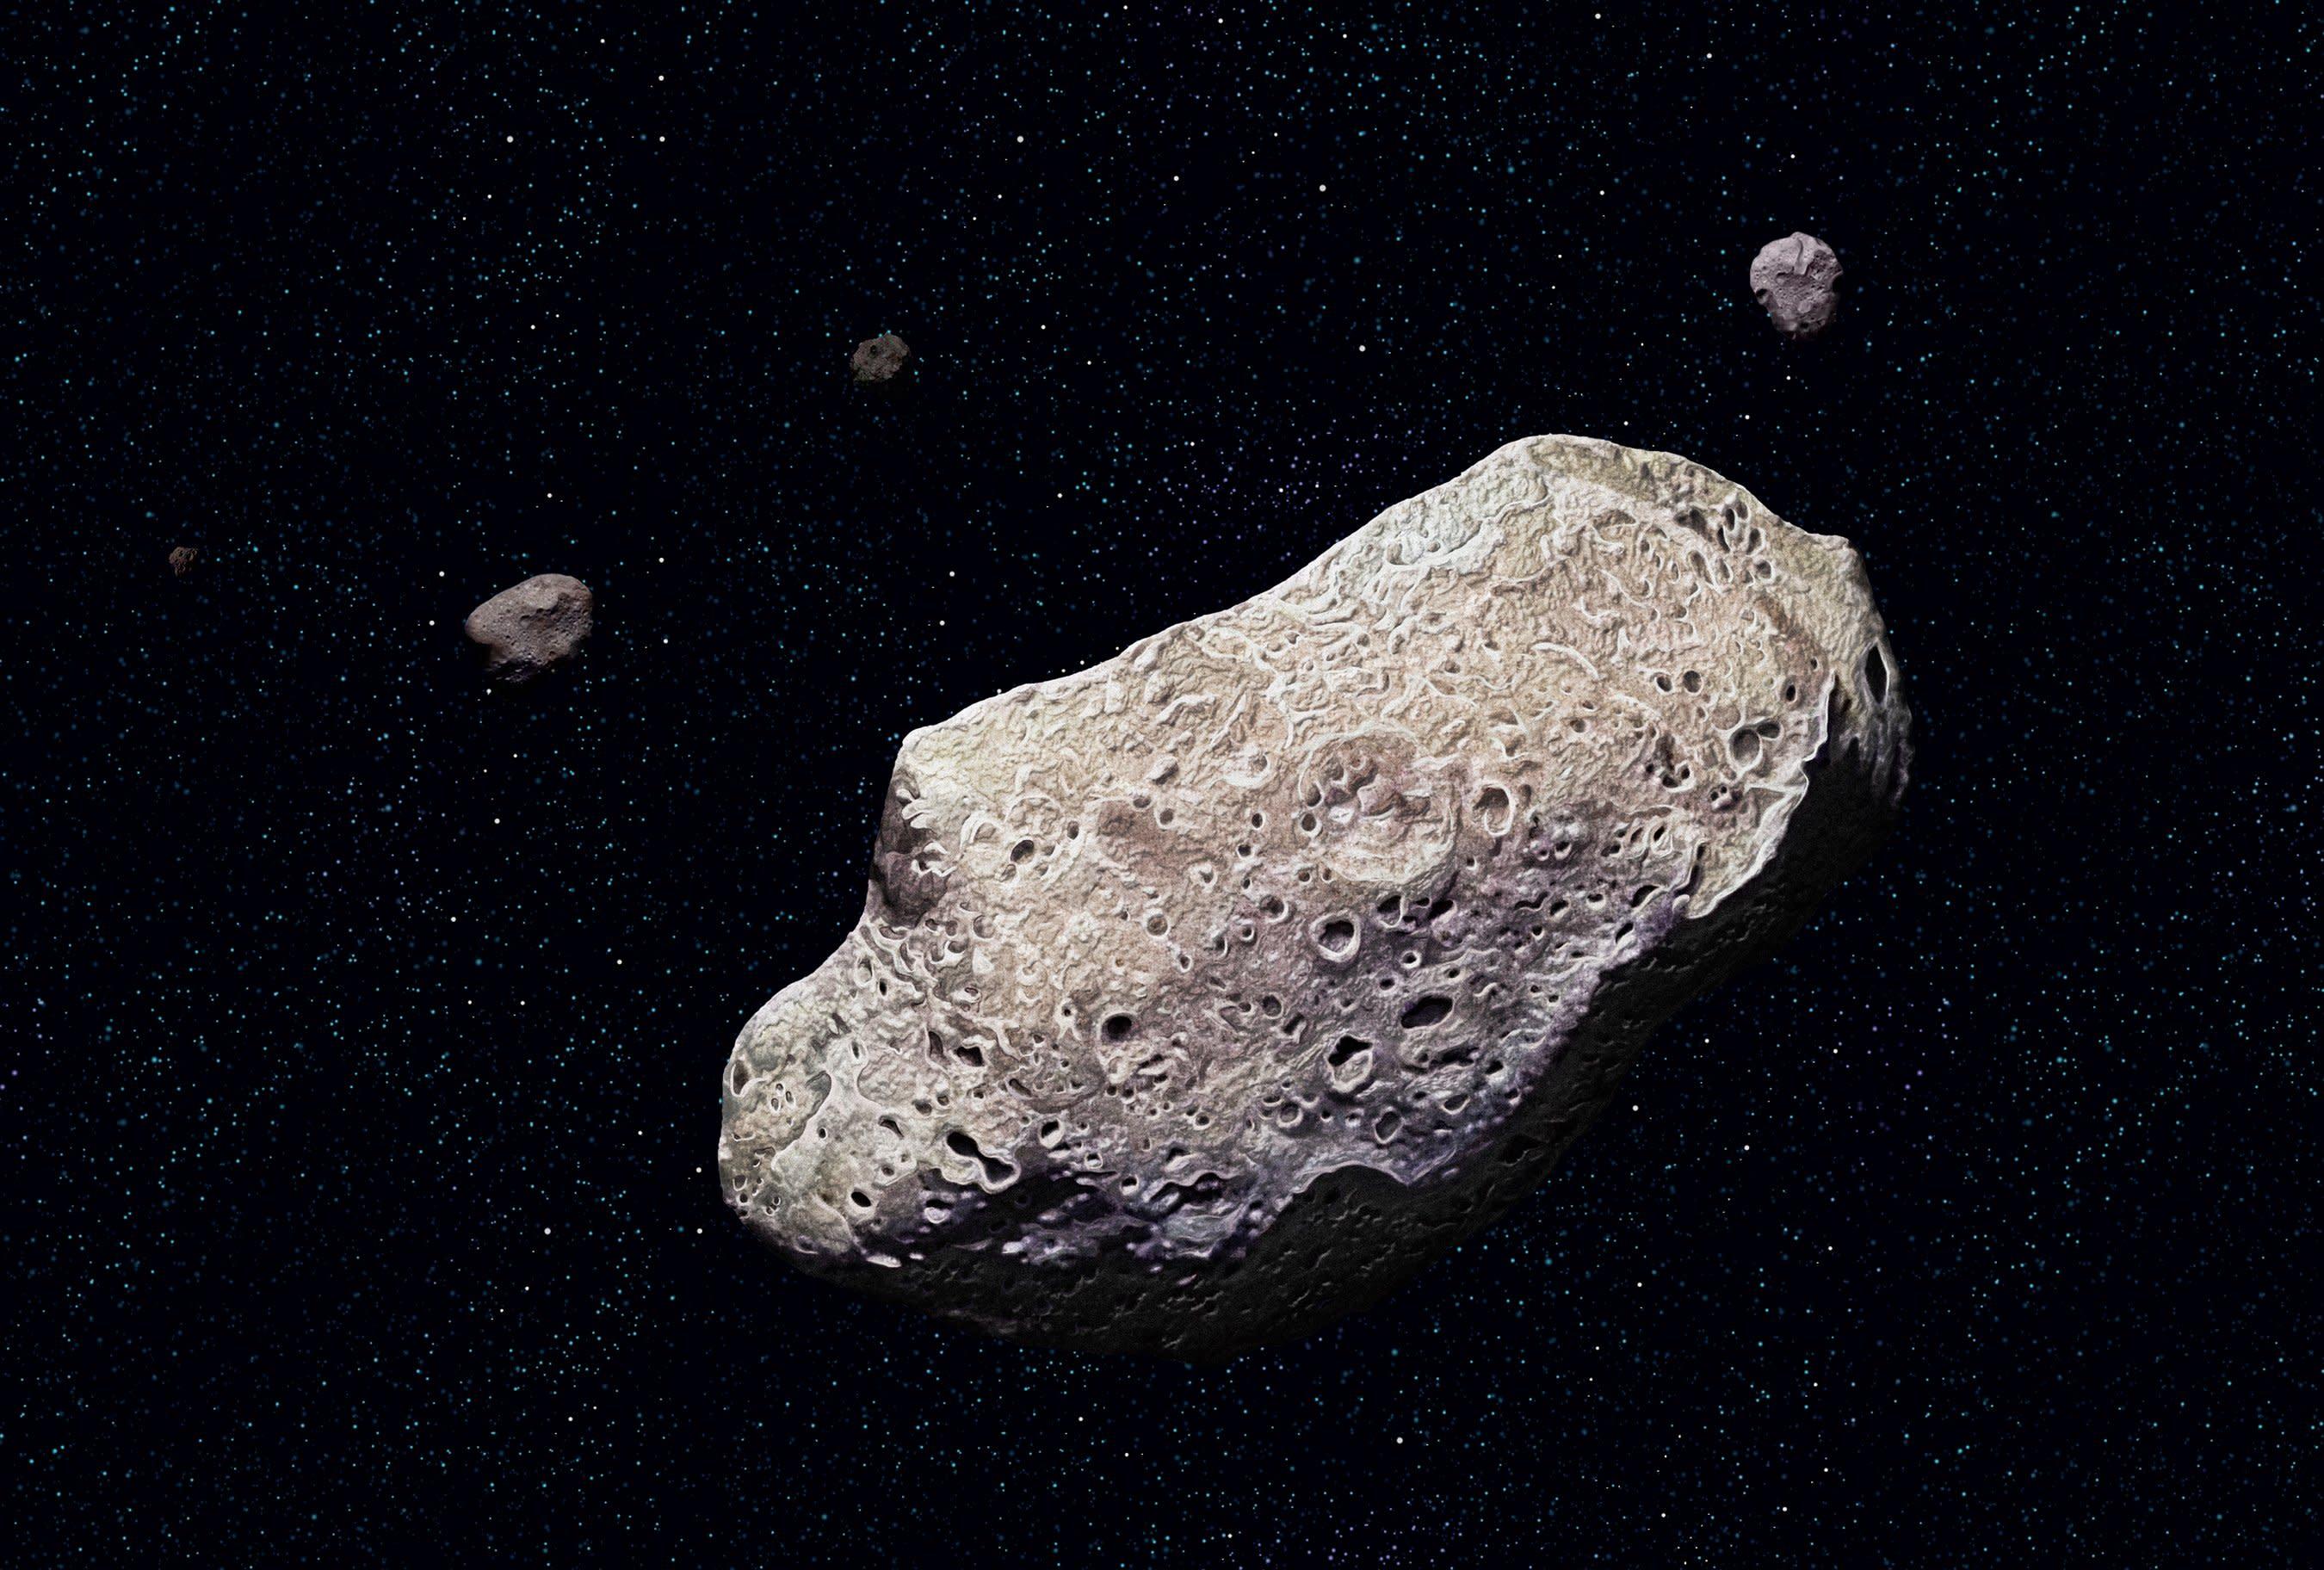 nasa asteroid tracker - HD2700×1824